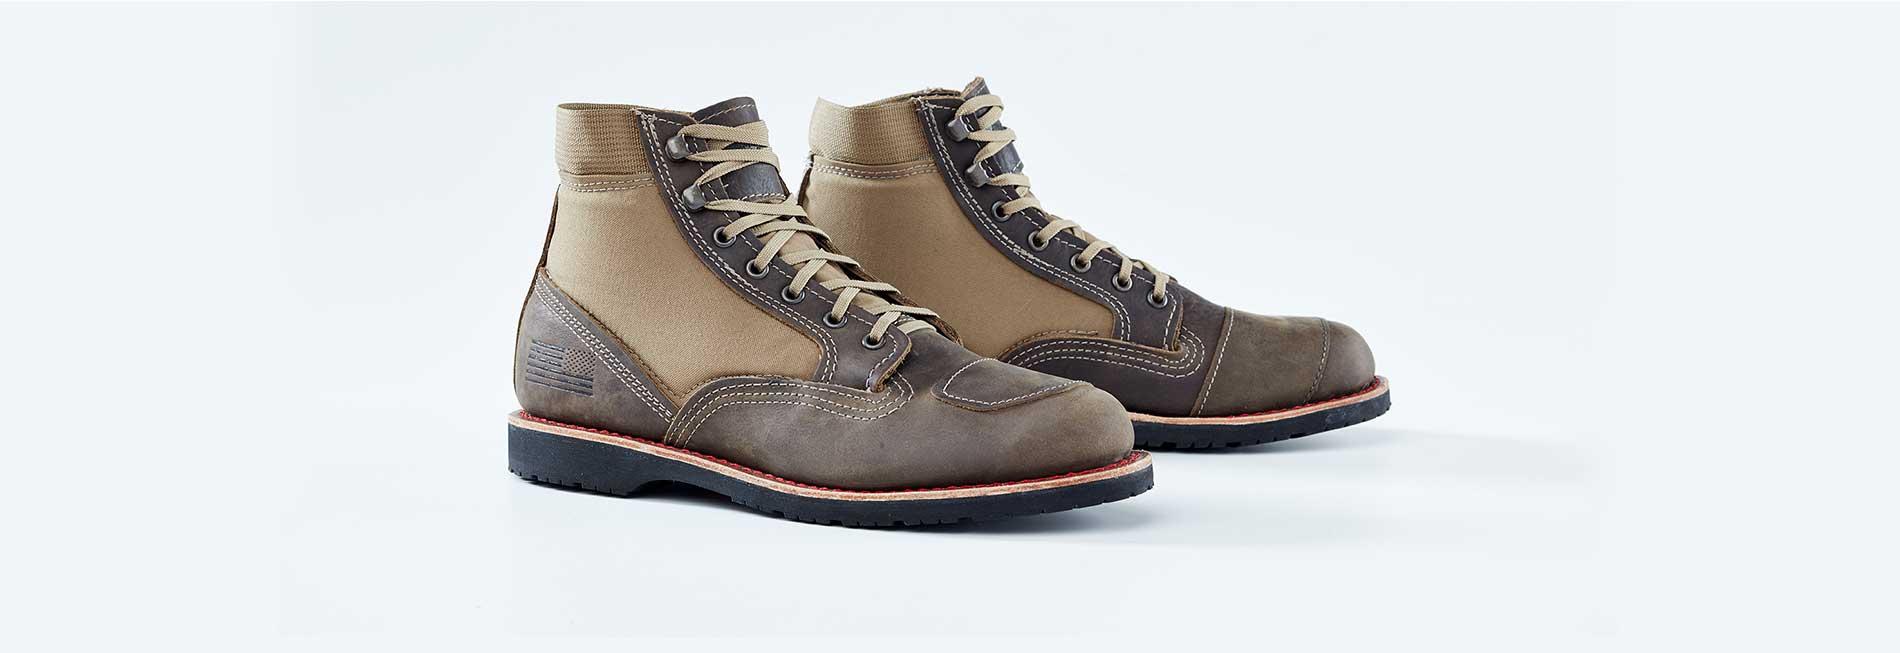 Men Freedom Boot Motorcycle Boots Bates Footwear